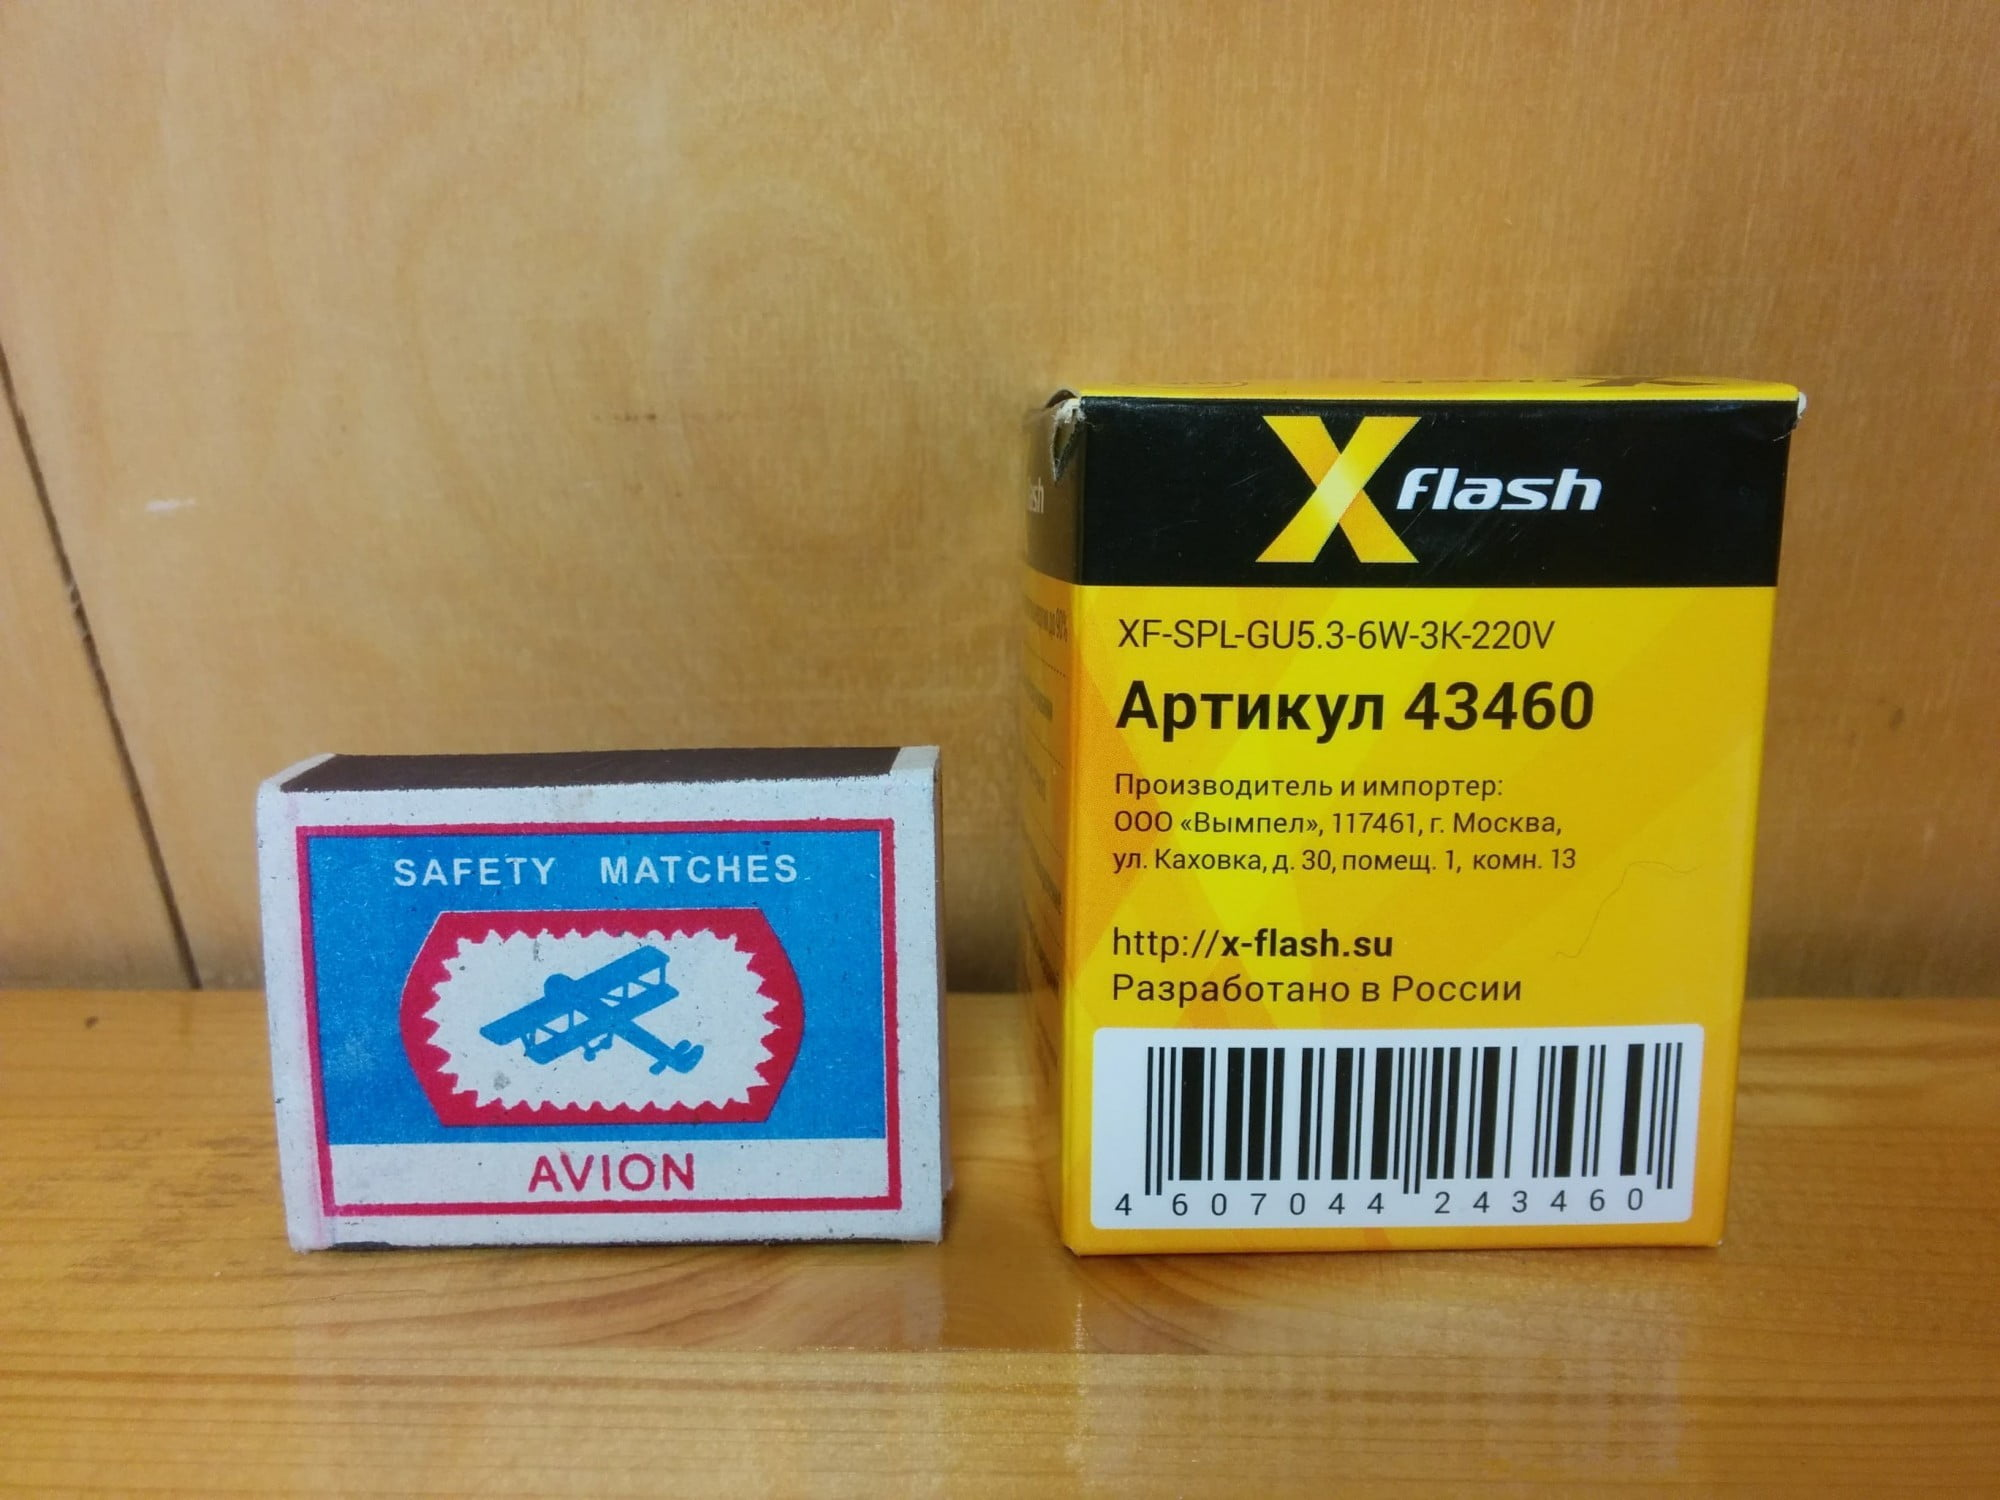 X-flash XF-SPL-GU5.3-6W-3000K-220V артикул